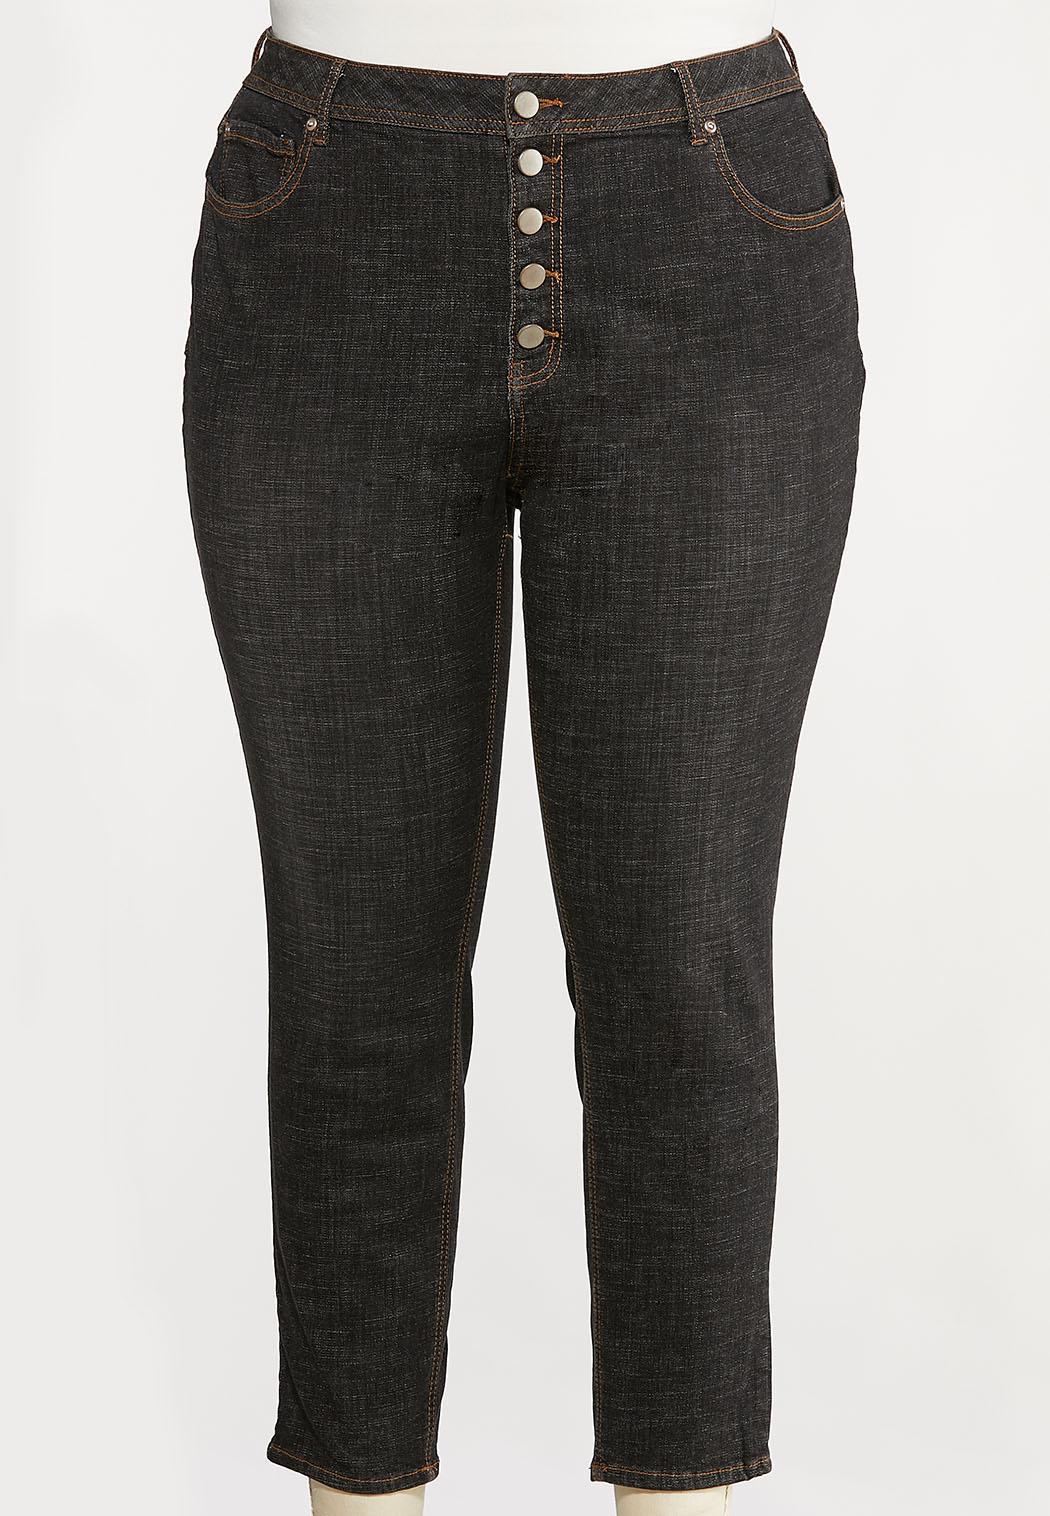 Plus Size Black High Waist Jeans